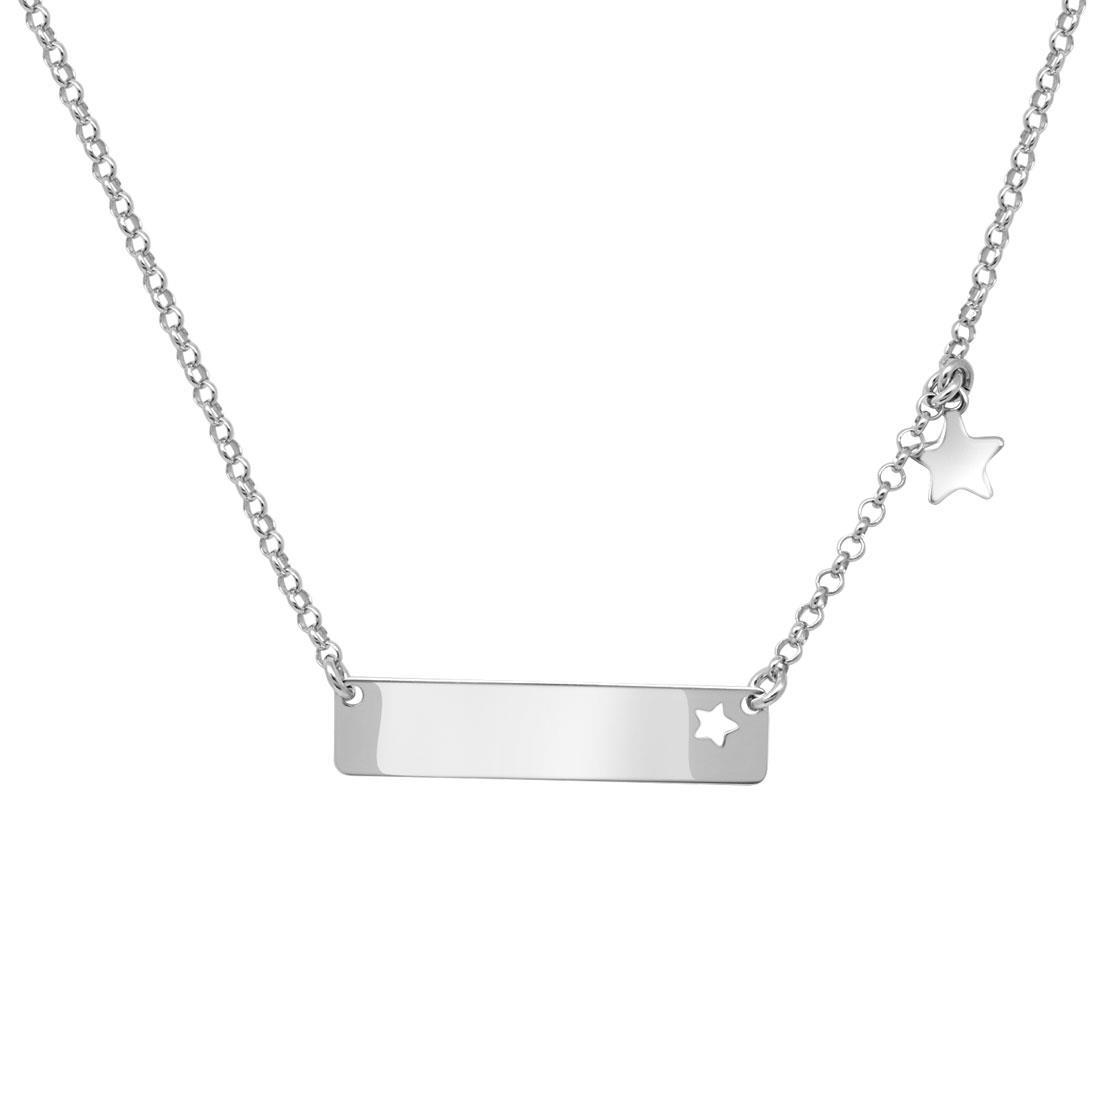 Collana in argento con piastrina - ORO&CO 925